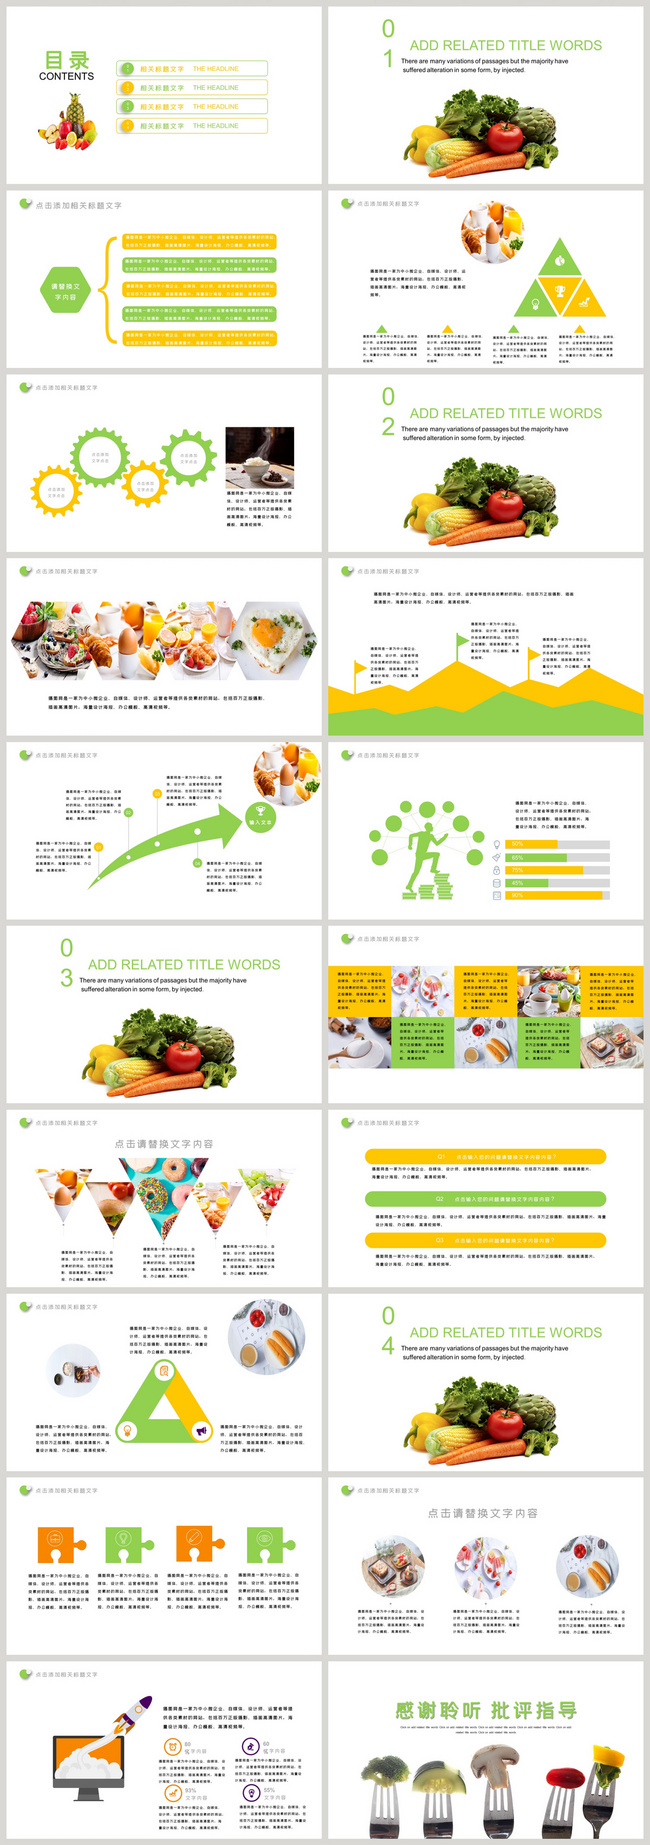 Template Ppt Promosi Makanan Makan Sehat Gambar Unduh Gratis Power Point 401307864 Format Gambar Pptx Lovepik Com